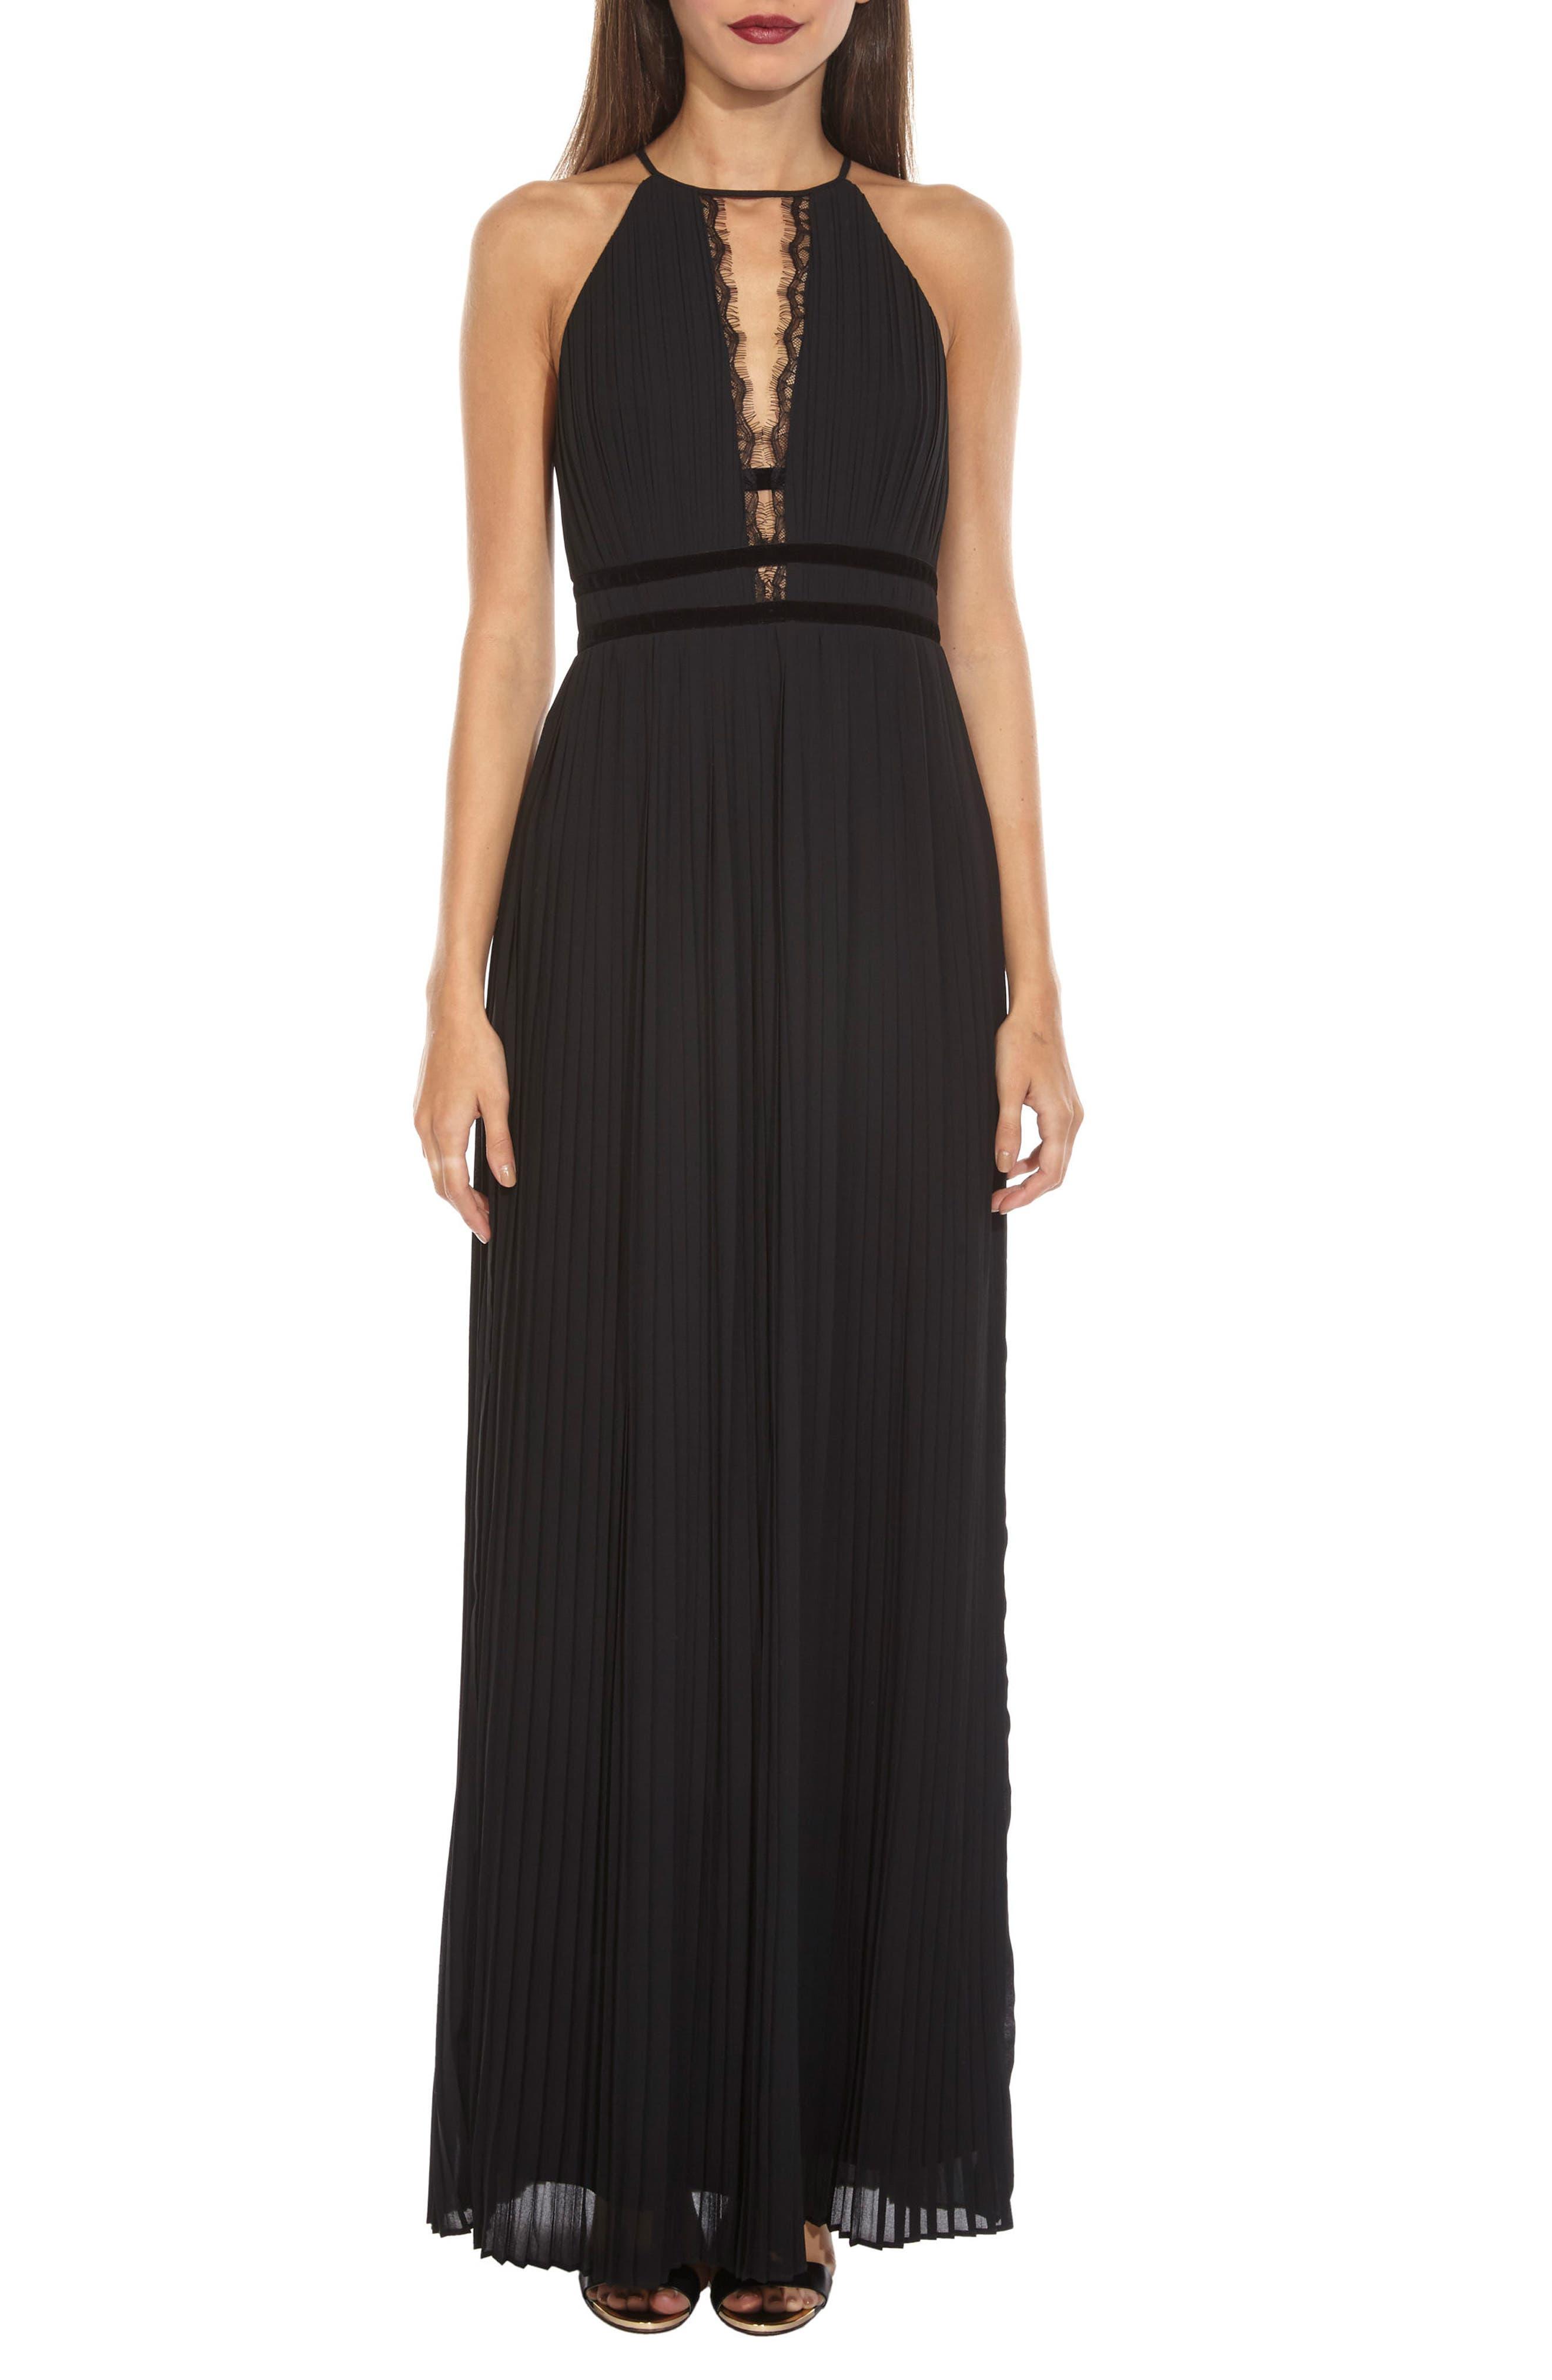 Aberda Plunging Keyhole Maxi Dress,                         Main,                         color, Black